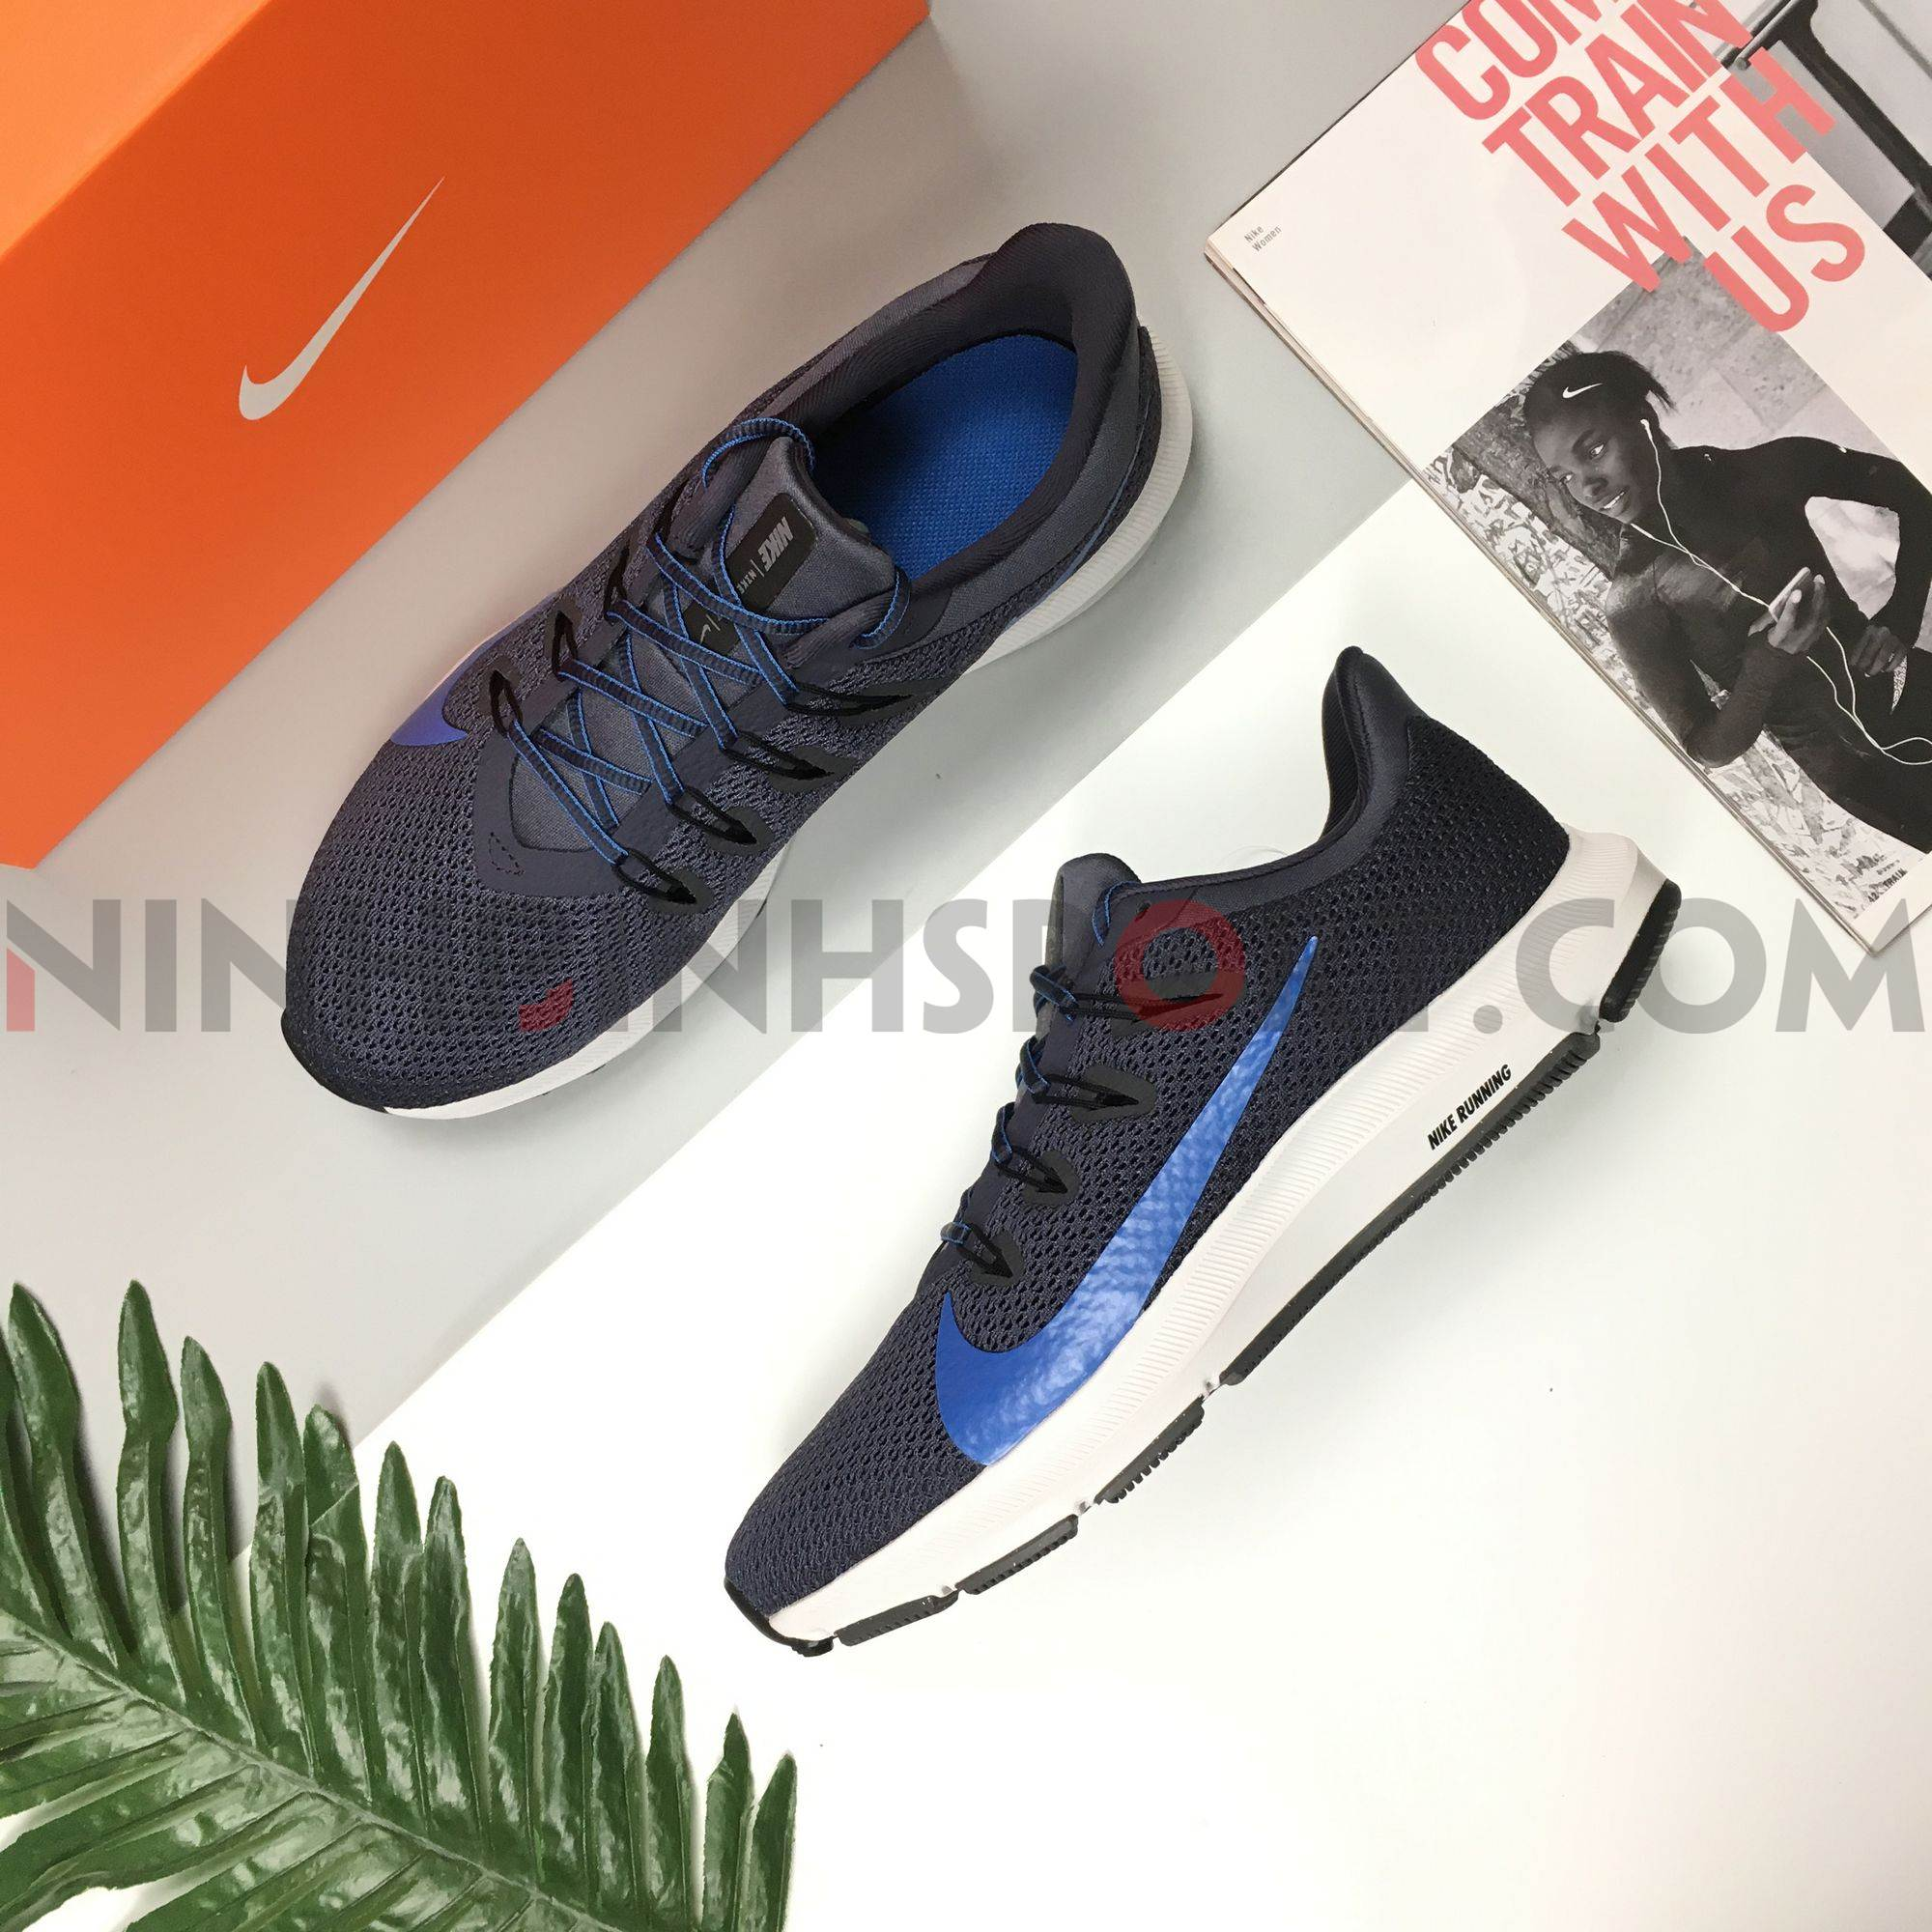 Giày thể thao nam Nike Quest 2 CI3787-007